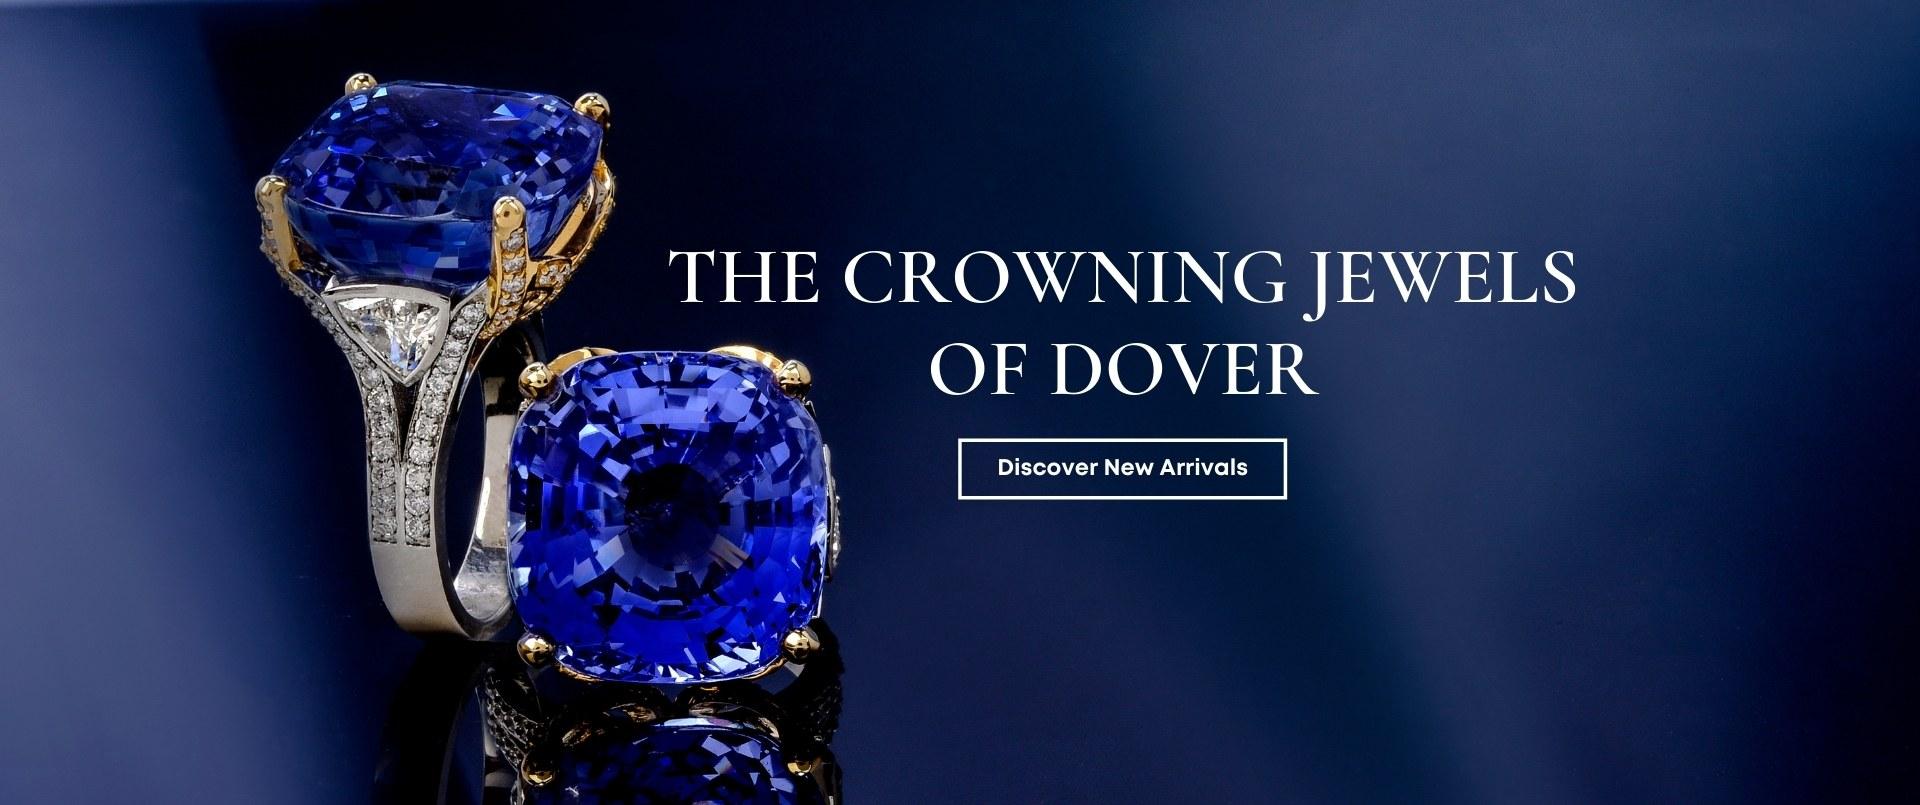 doverjewelry.com new-arrivals